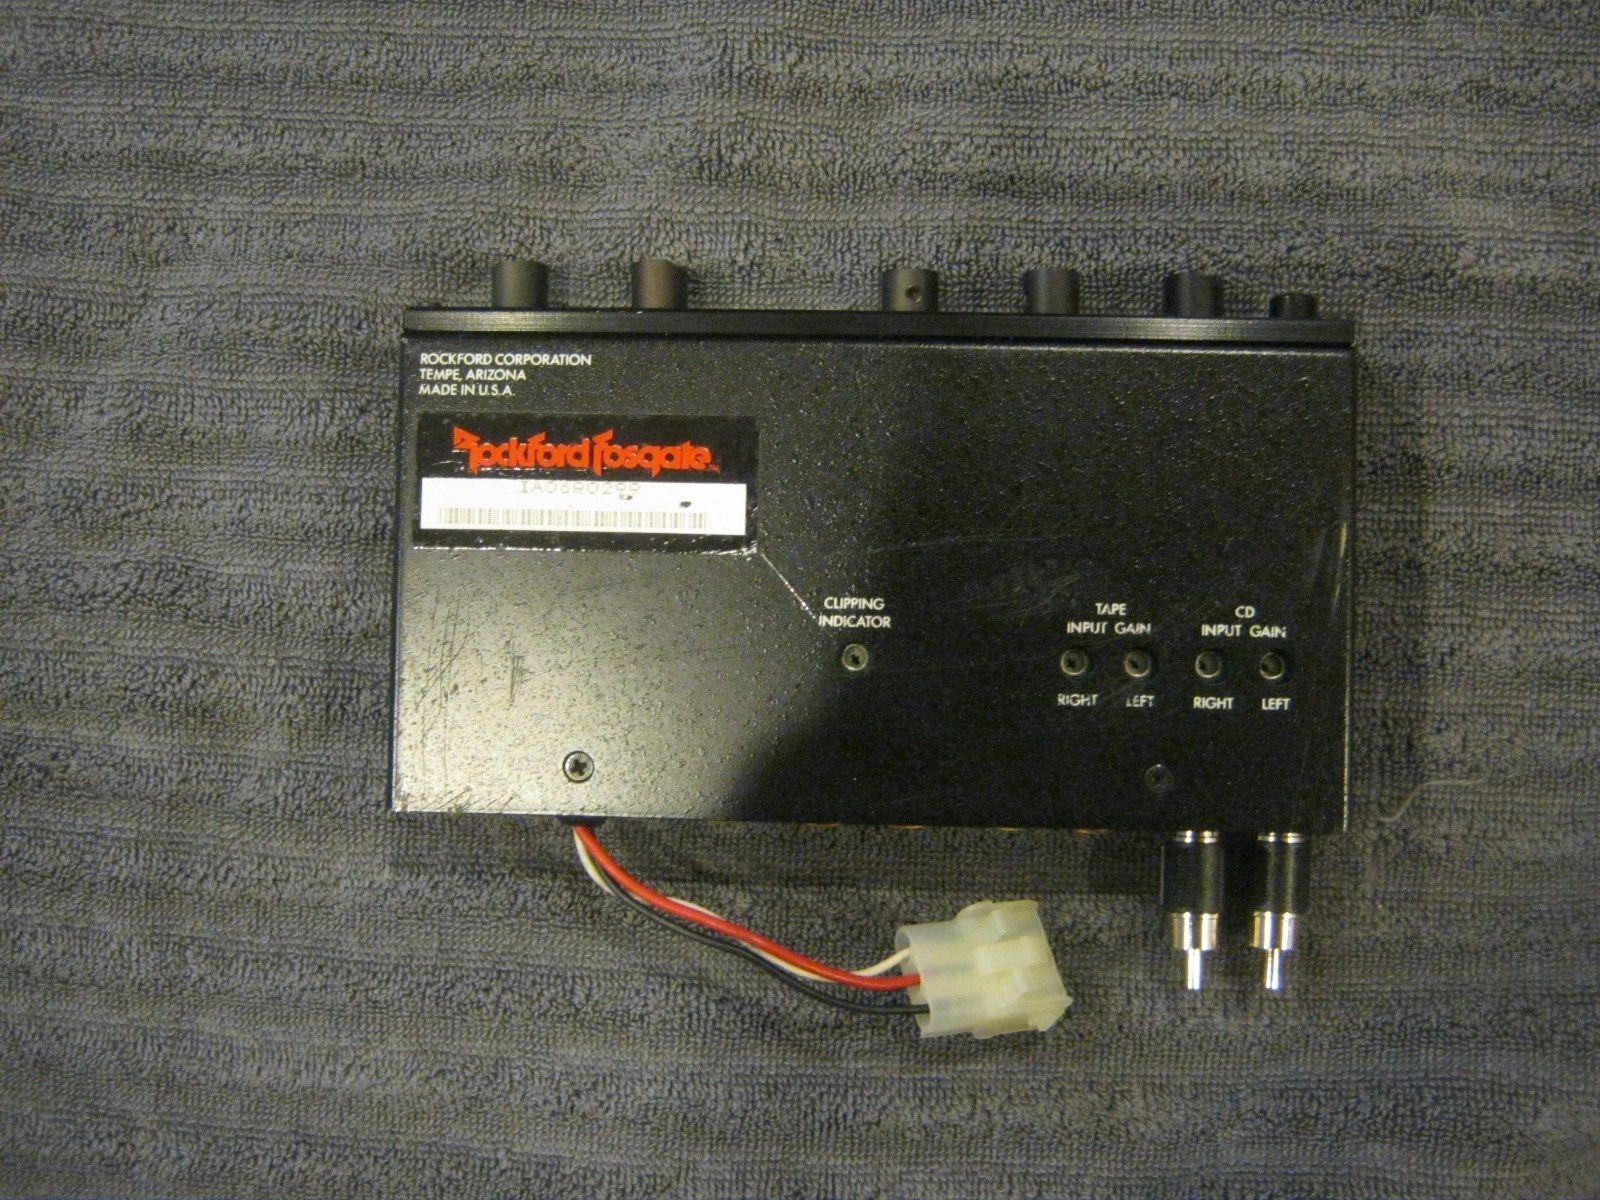 47d3c2bd4d60e54fdc1c8af076ada6eb rockford fosgate old school amps*** (1) mosfet 650 & (3) punch 150